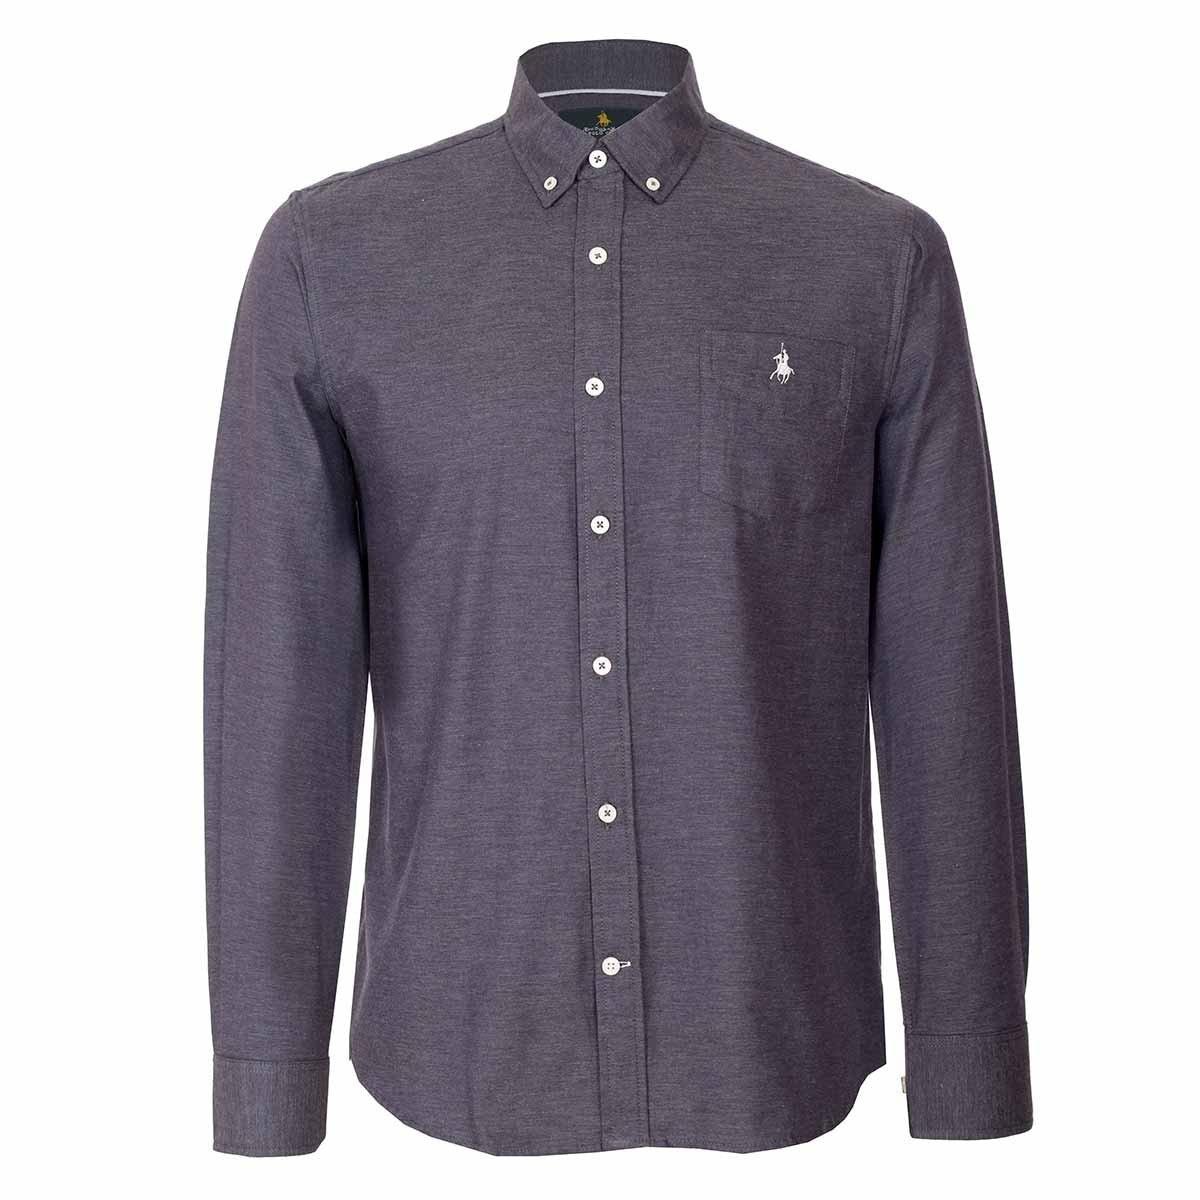 7b72e4cd81 Camisa Lisa Polo Club -   1